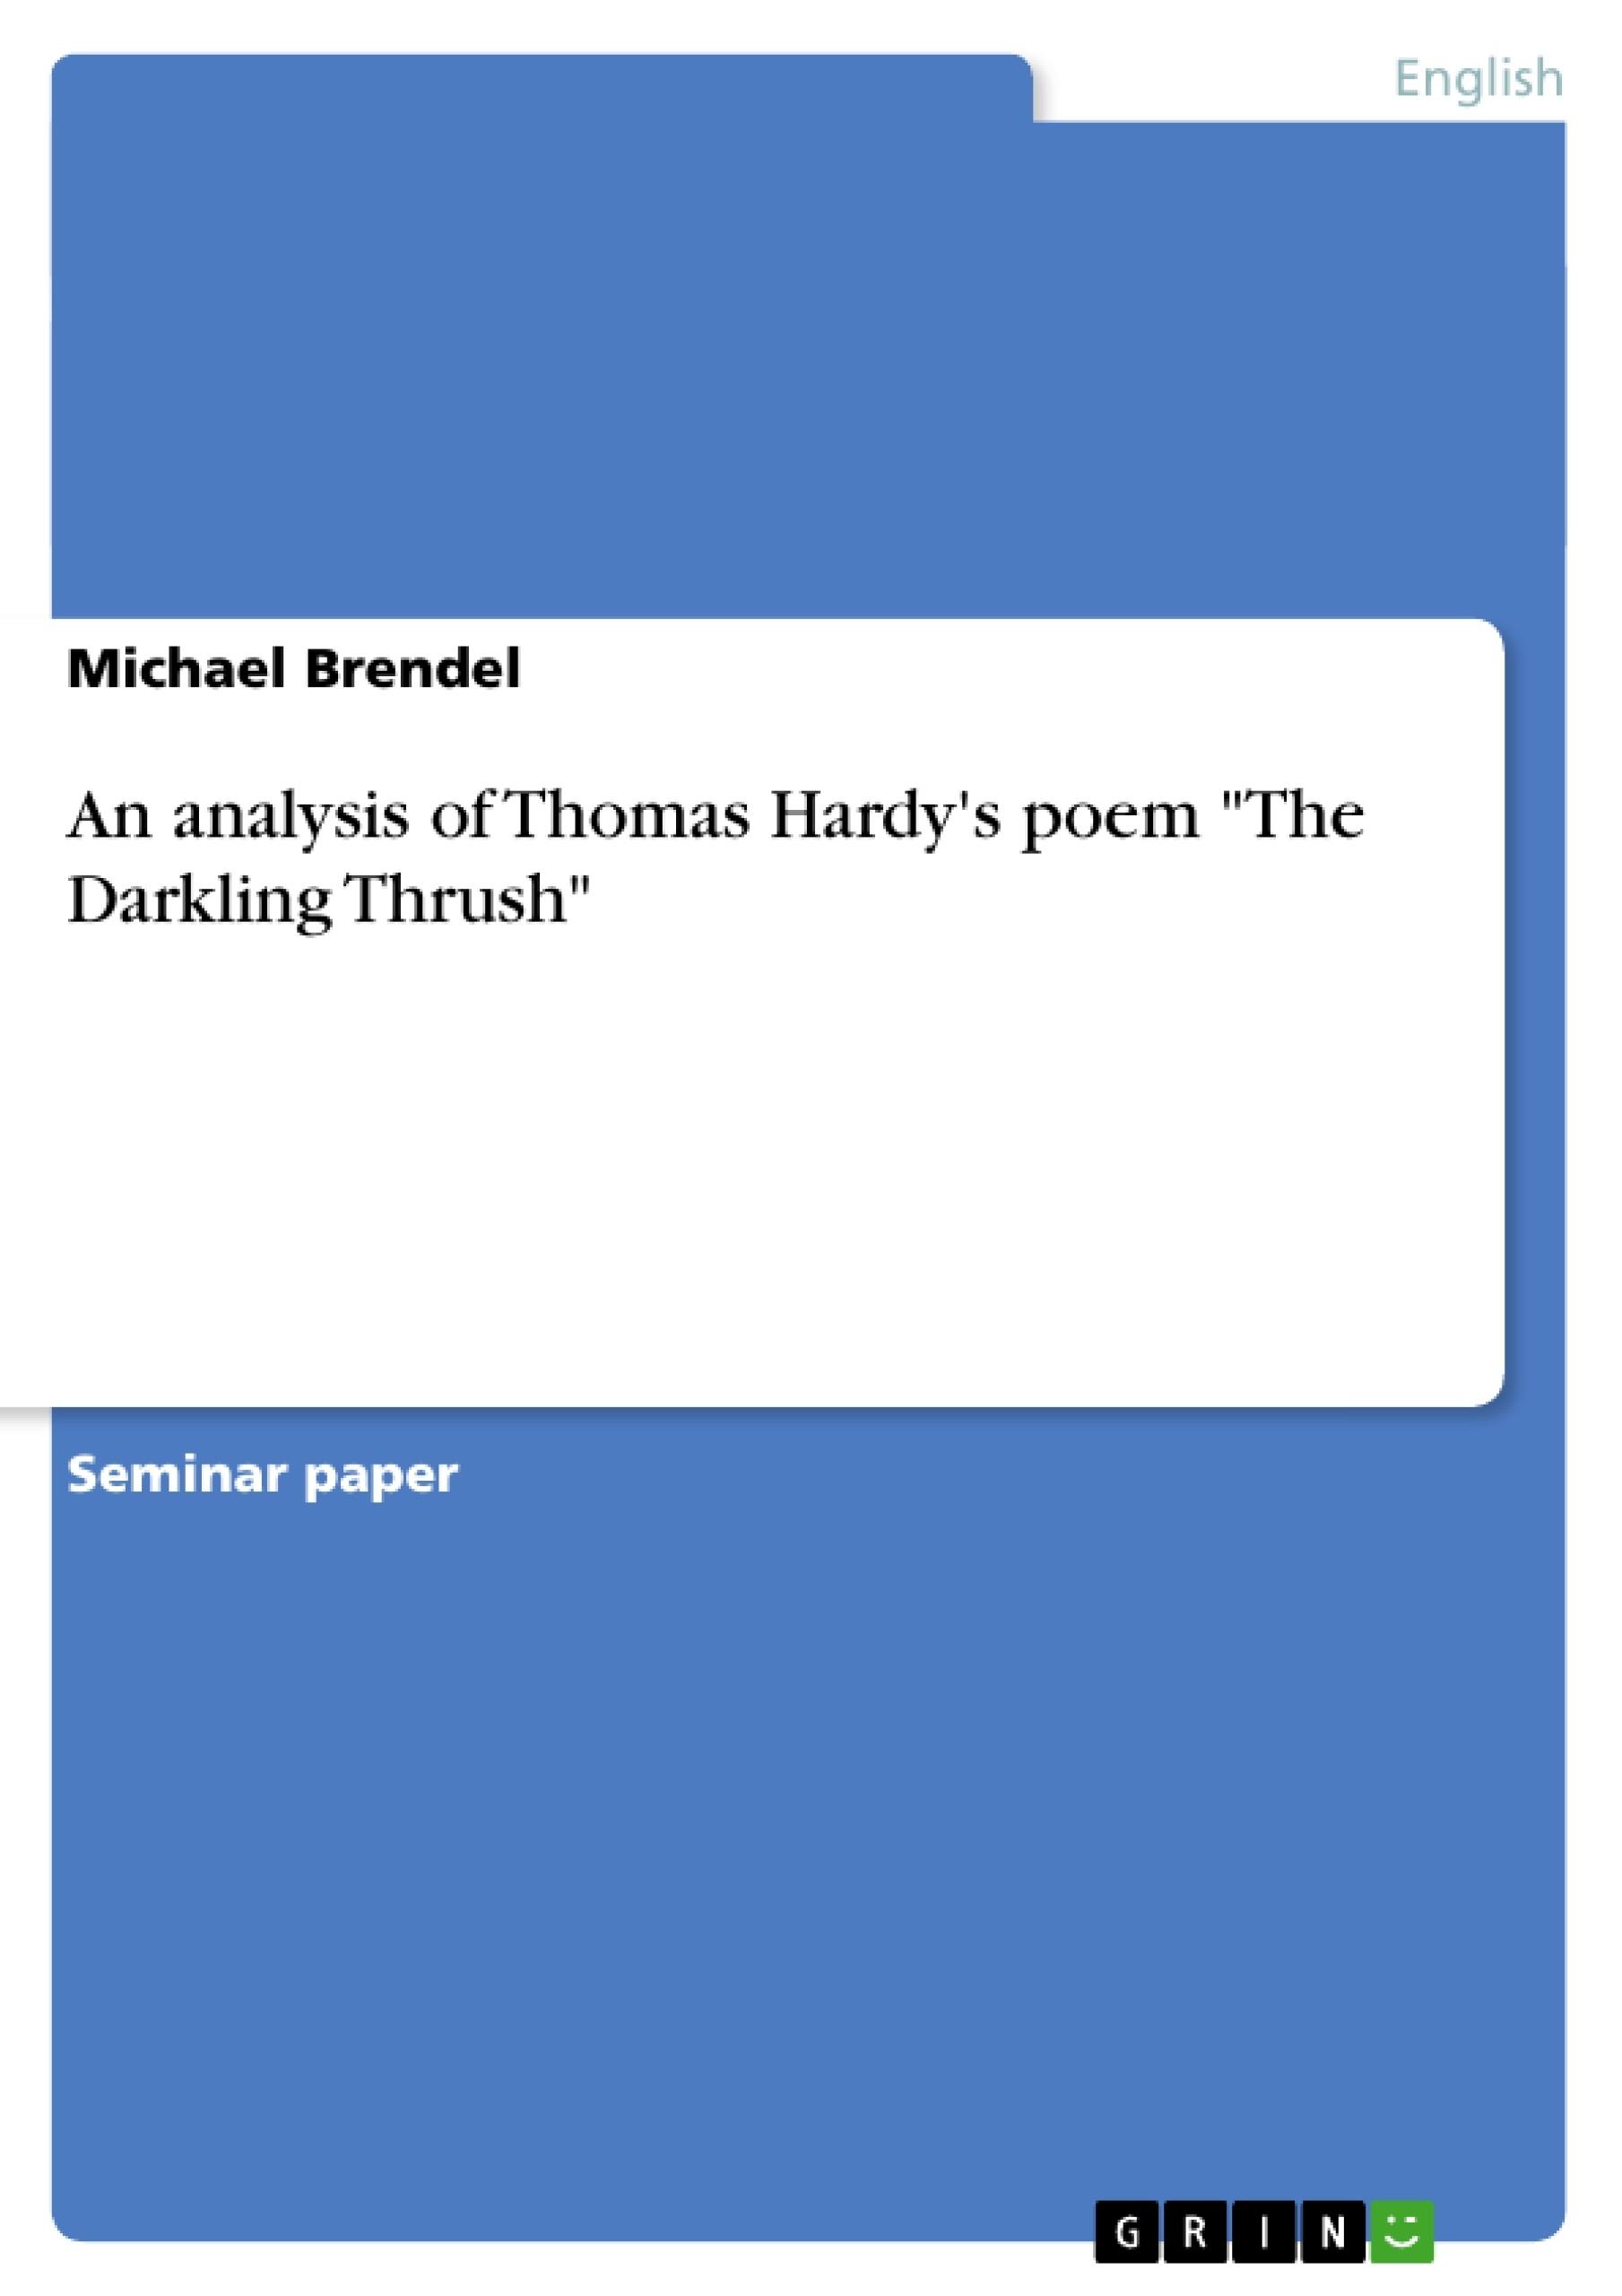 Thomas hardy the darkling thrush essay writing